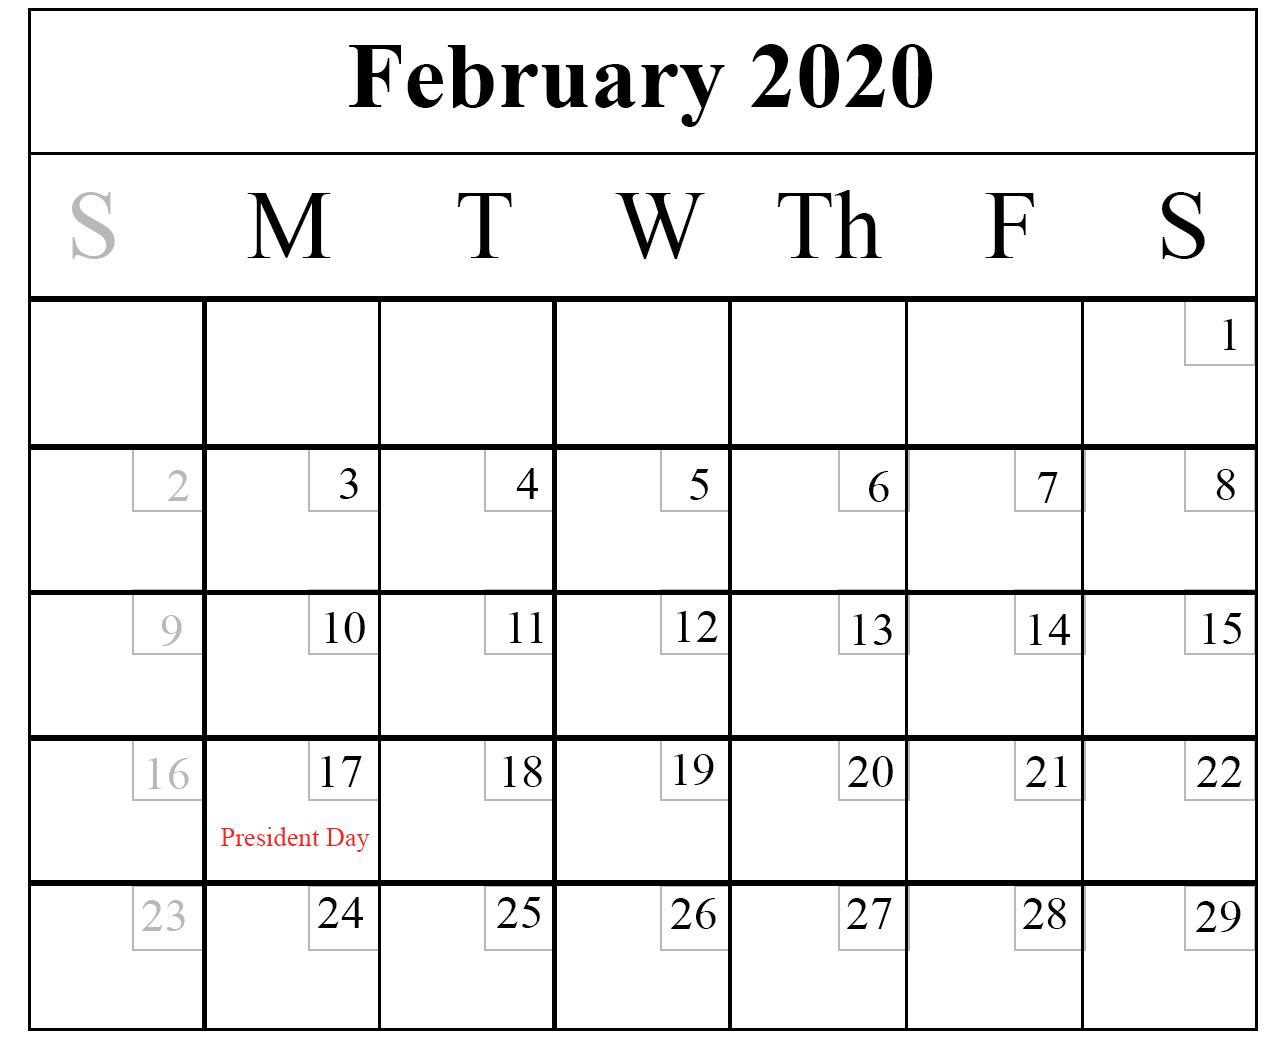 Free February Calendar Template | Printable Calendar inside Vertex Calendars 2020 Printable